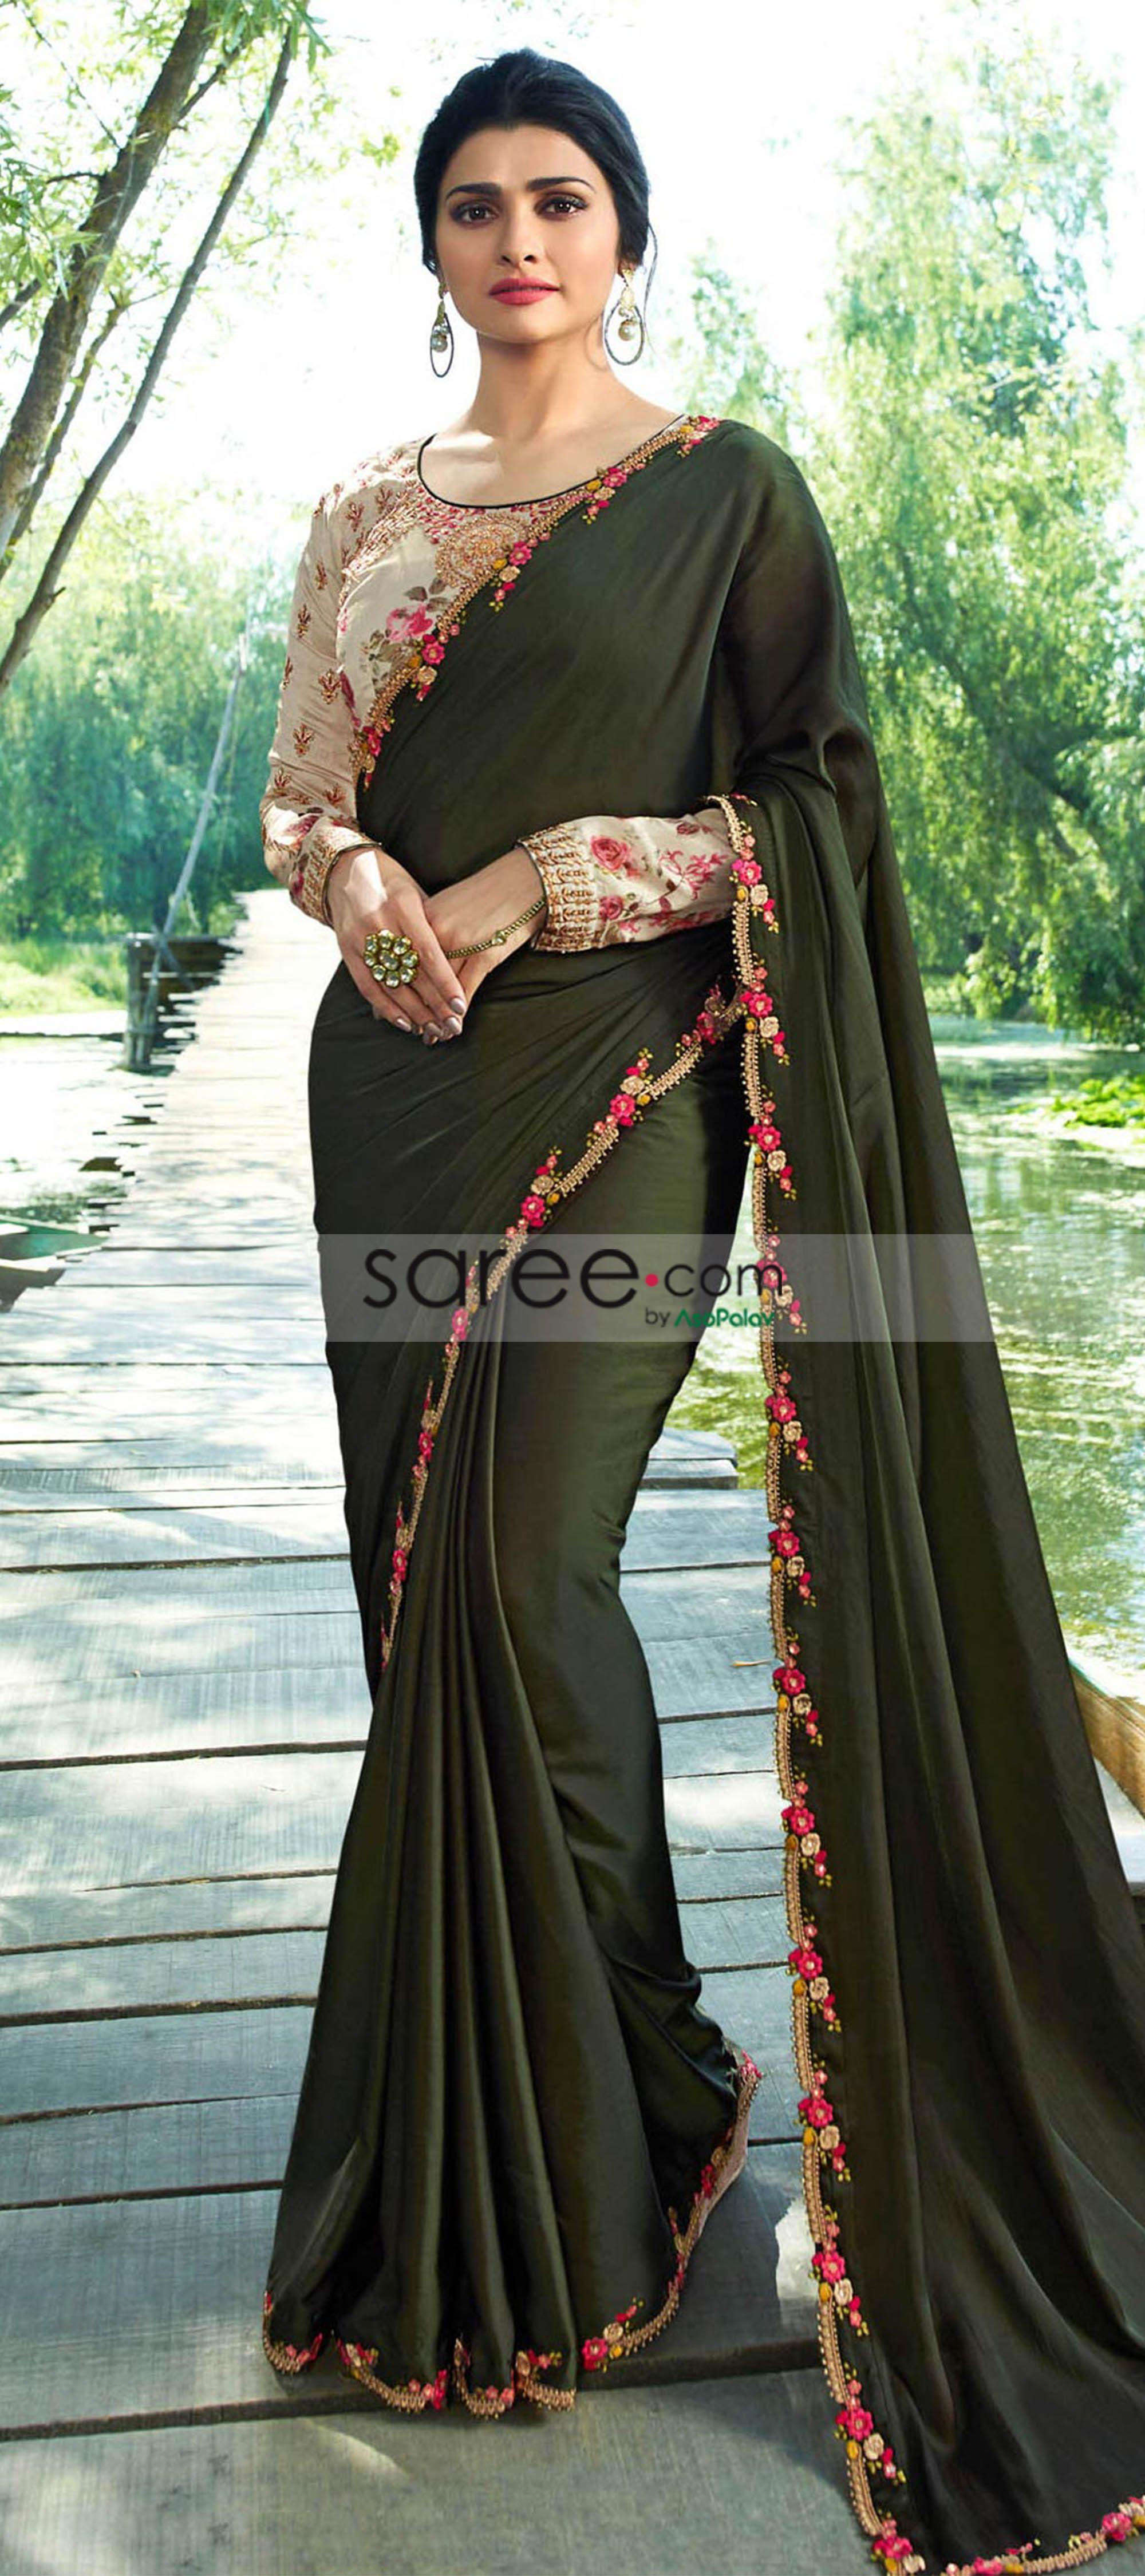 41693dcf292139 Prachi Desai Olive Green Satin Silk Plain Saree With Designer Blouse. OLIVE GREEN  PARTY WEAR SAREE